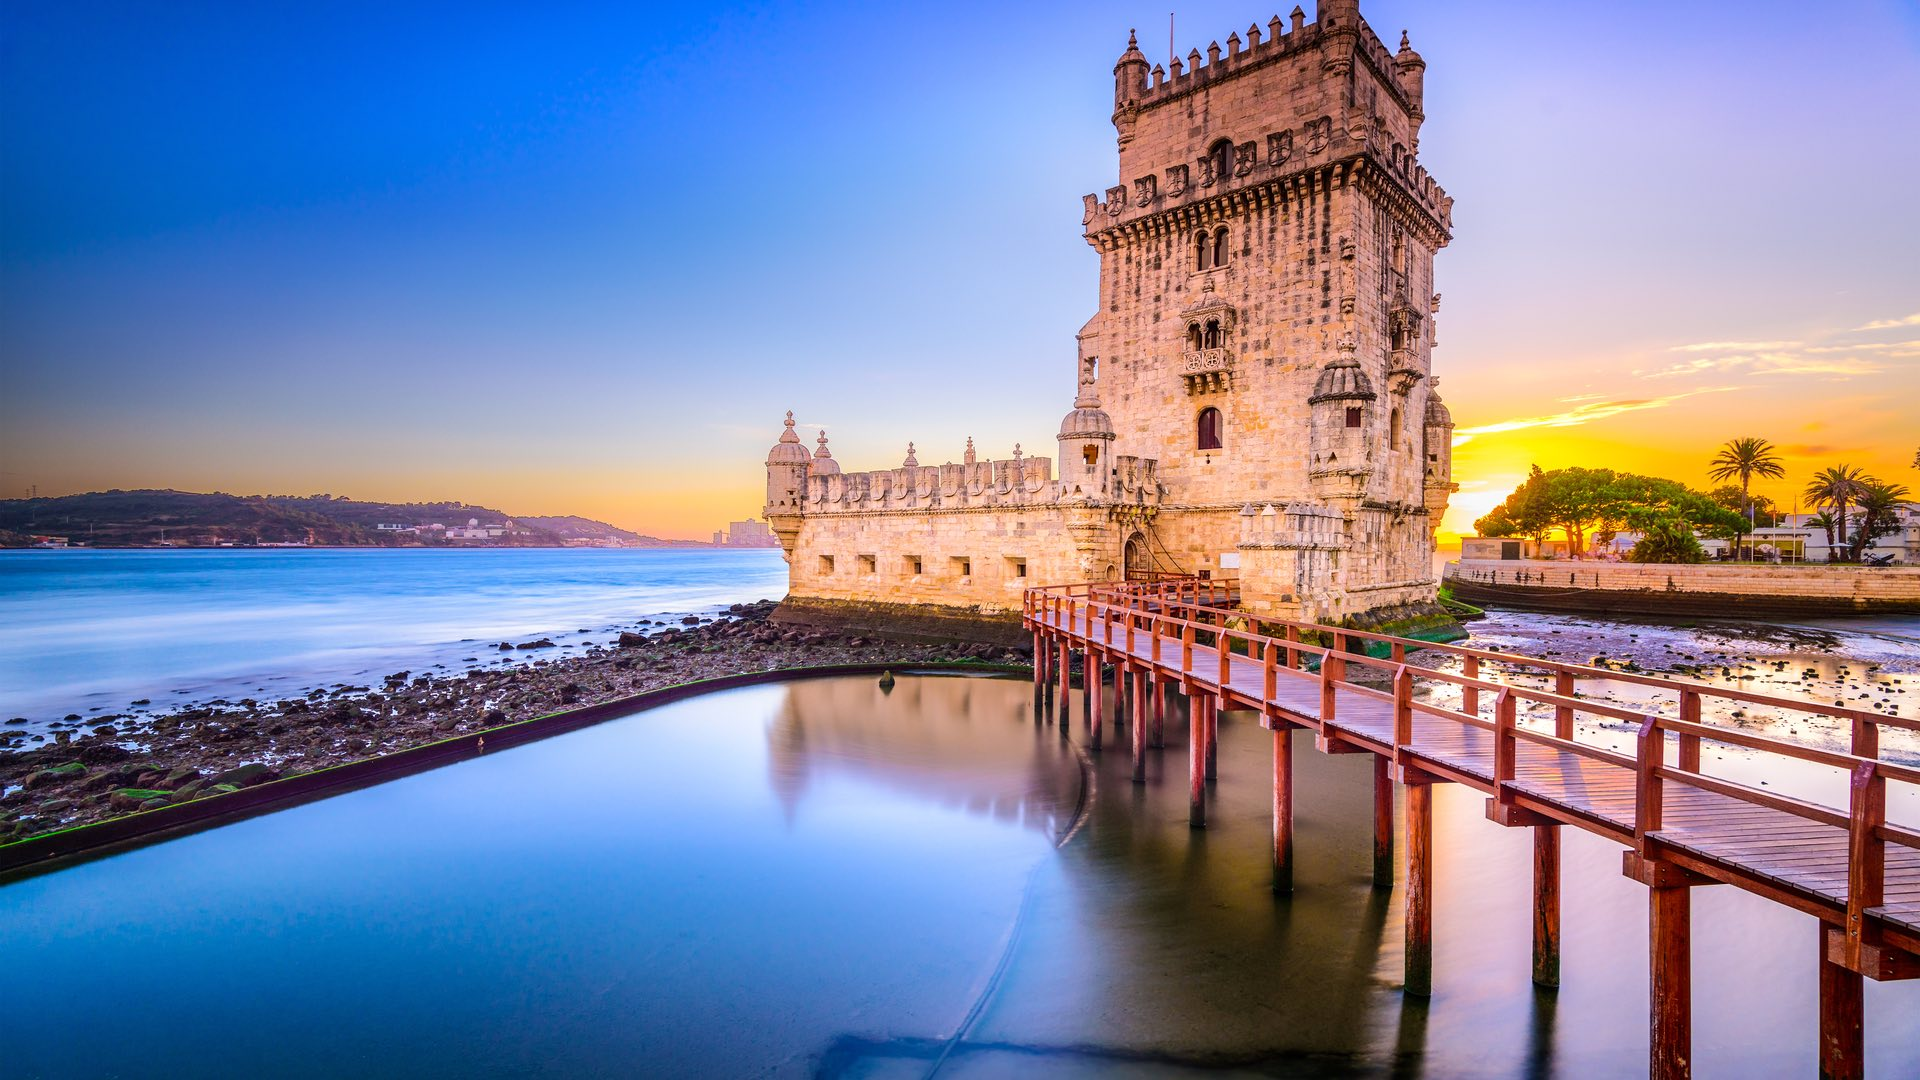 Portugal | Lissabon | ©Sean Pavone/Shutterstock.com